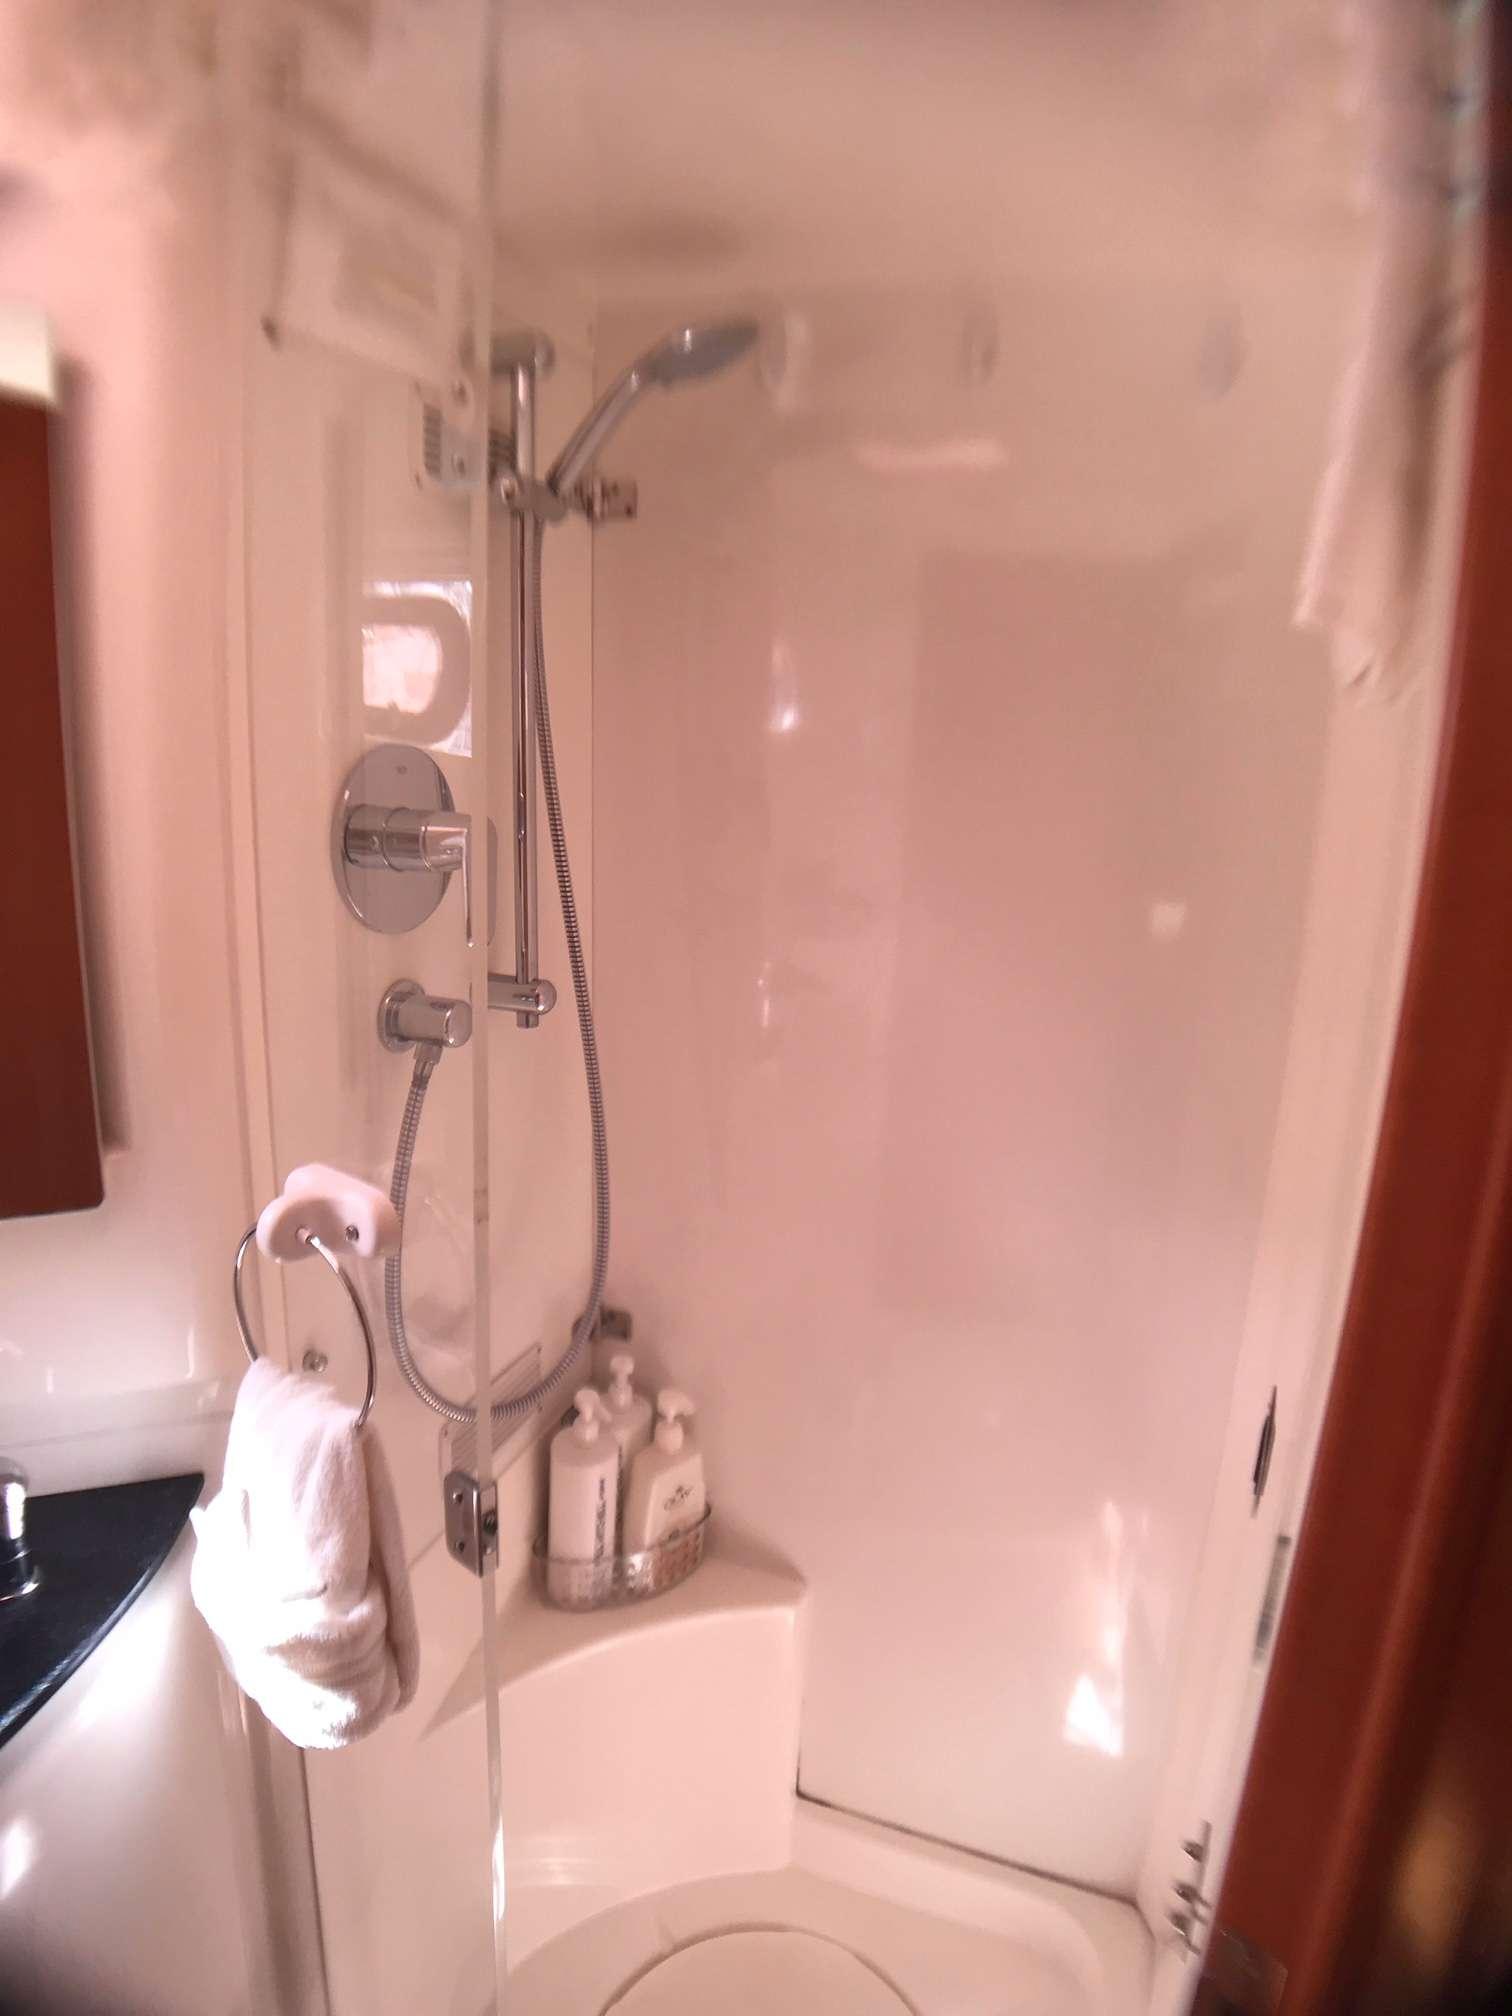 Catamaran Yacht 'STARFISH' Separate shower stalls in each bathroom., 6 PAX, 2 Crew, 46.00 Ft, 14.00 Meters, Built 2008, Leopard, Refit Year 2019